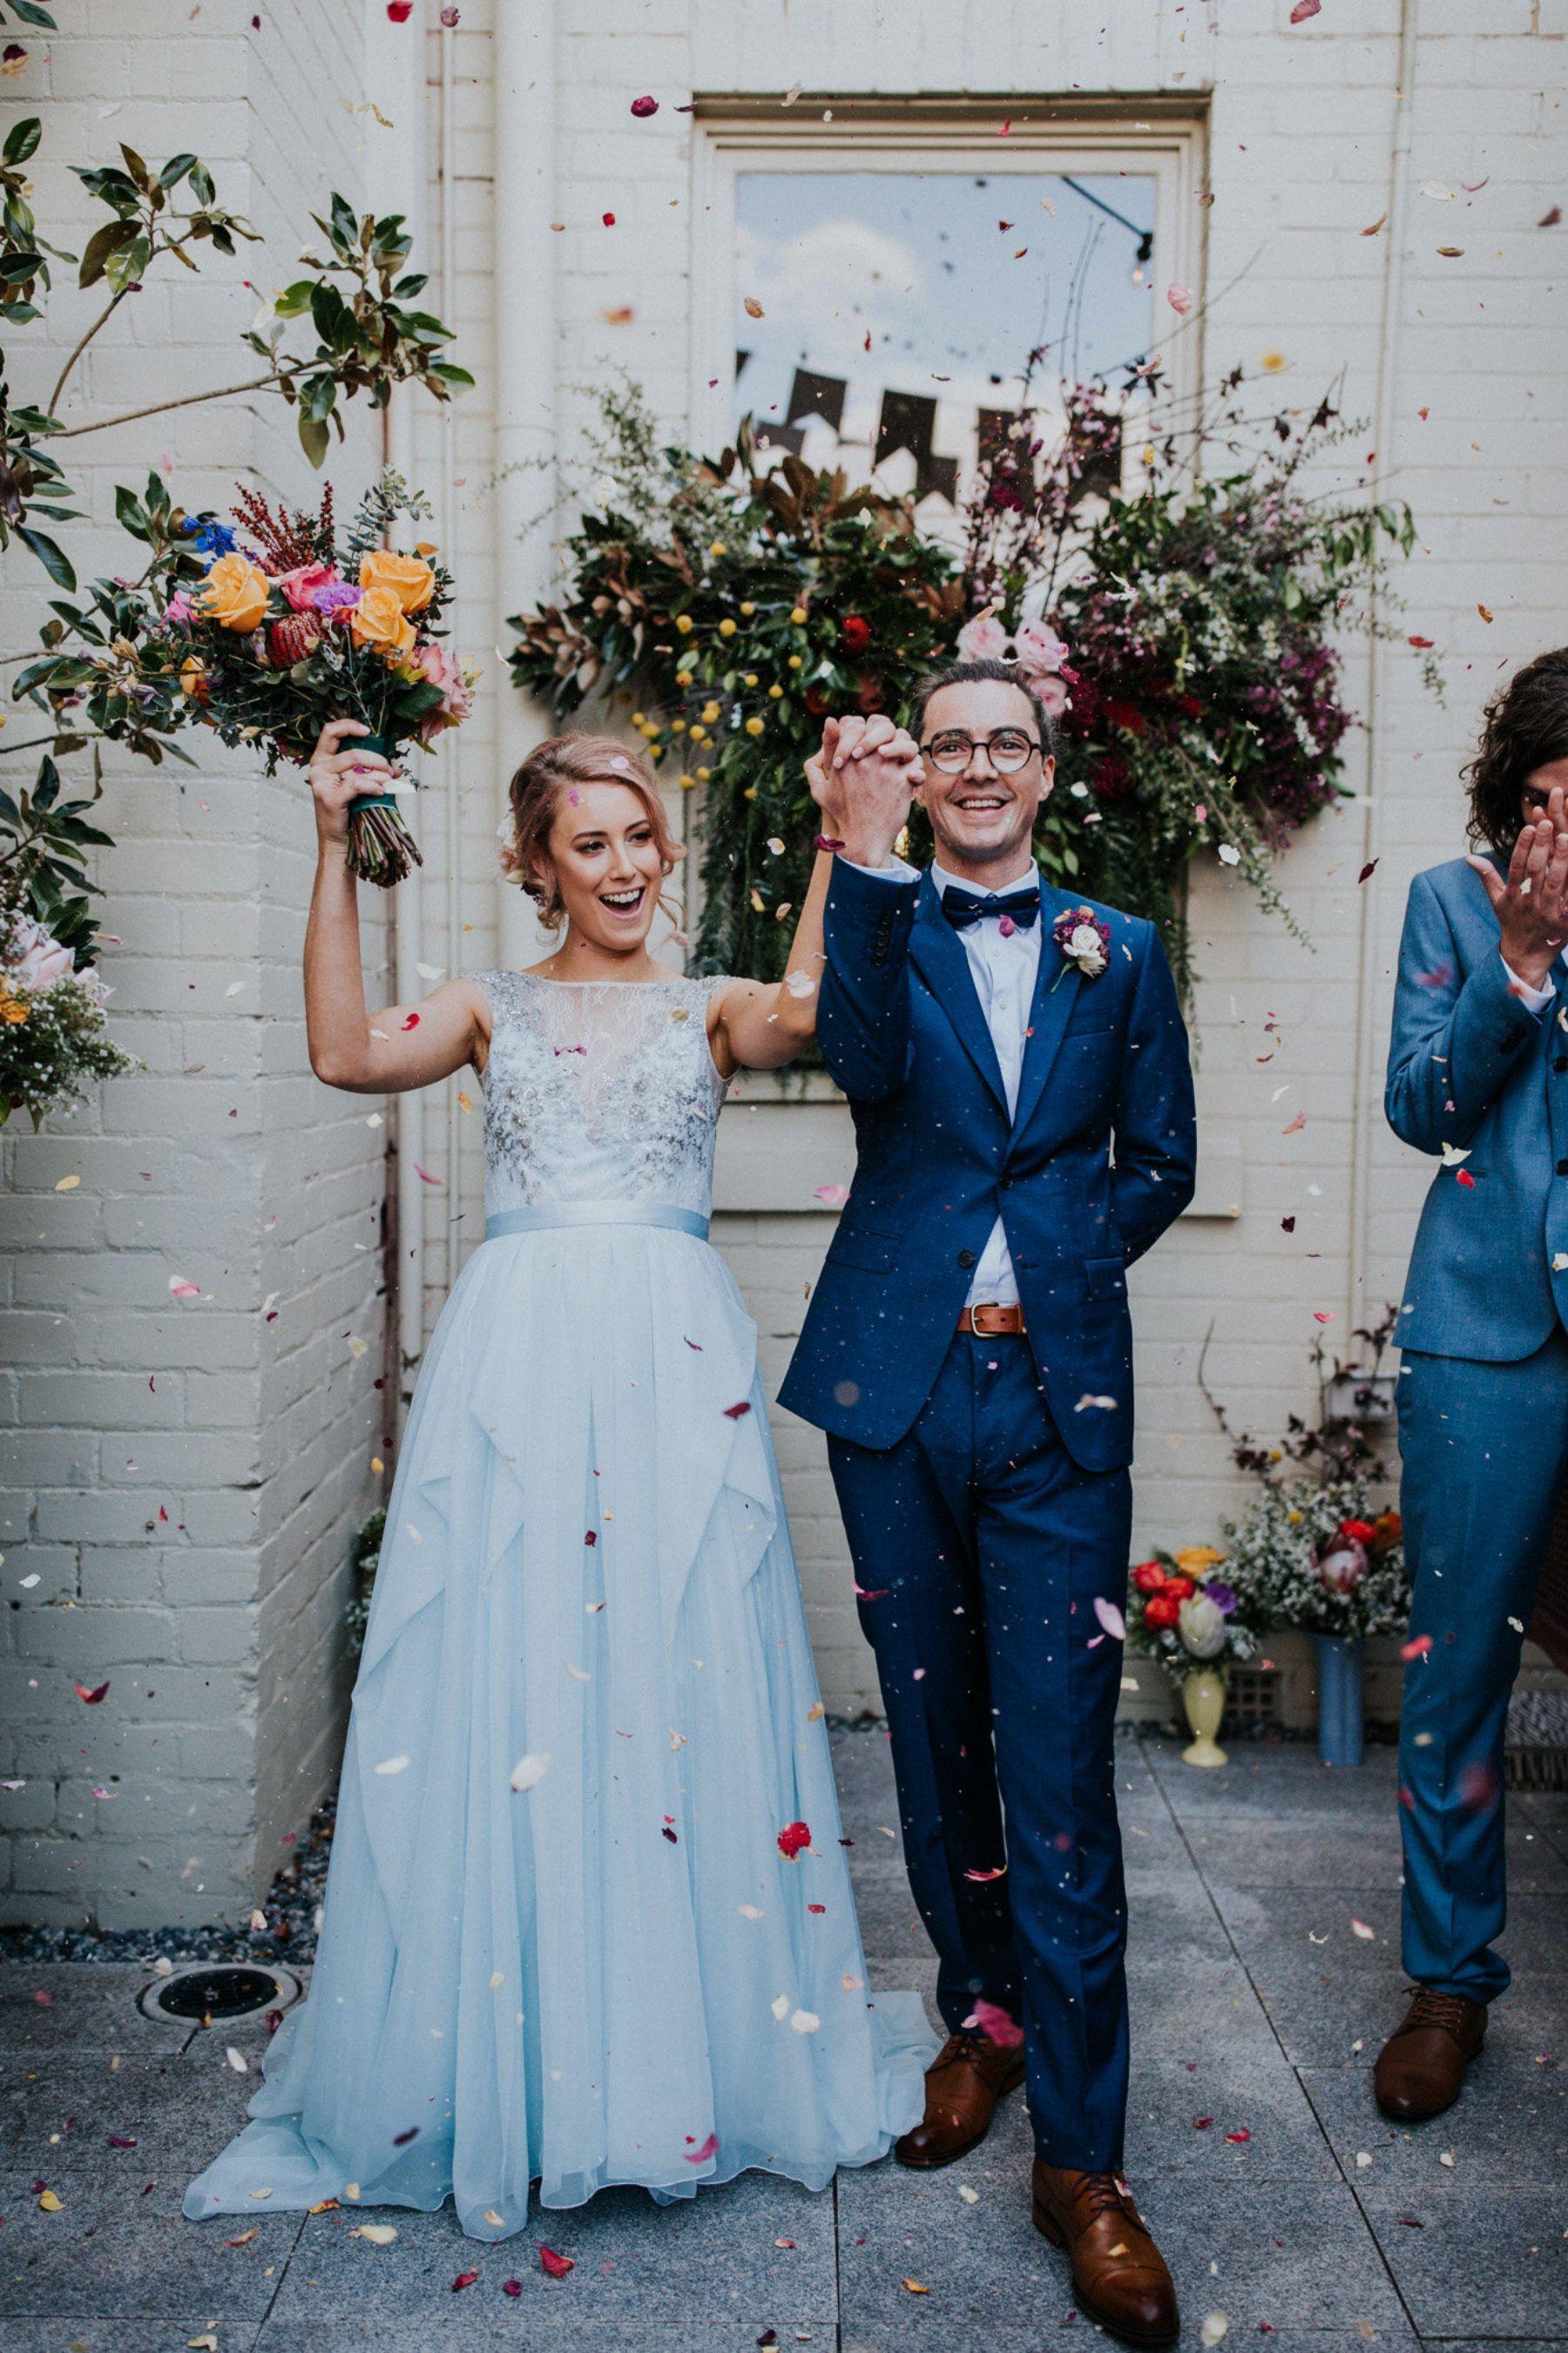 Marina u camus vibrant fremantle wedding at guildhall uc